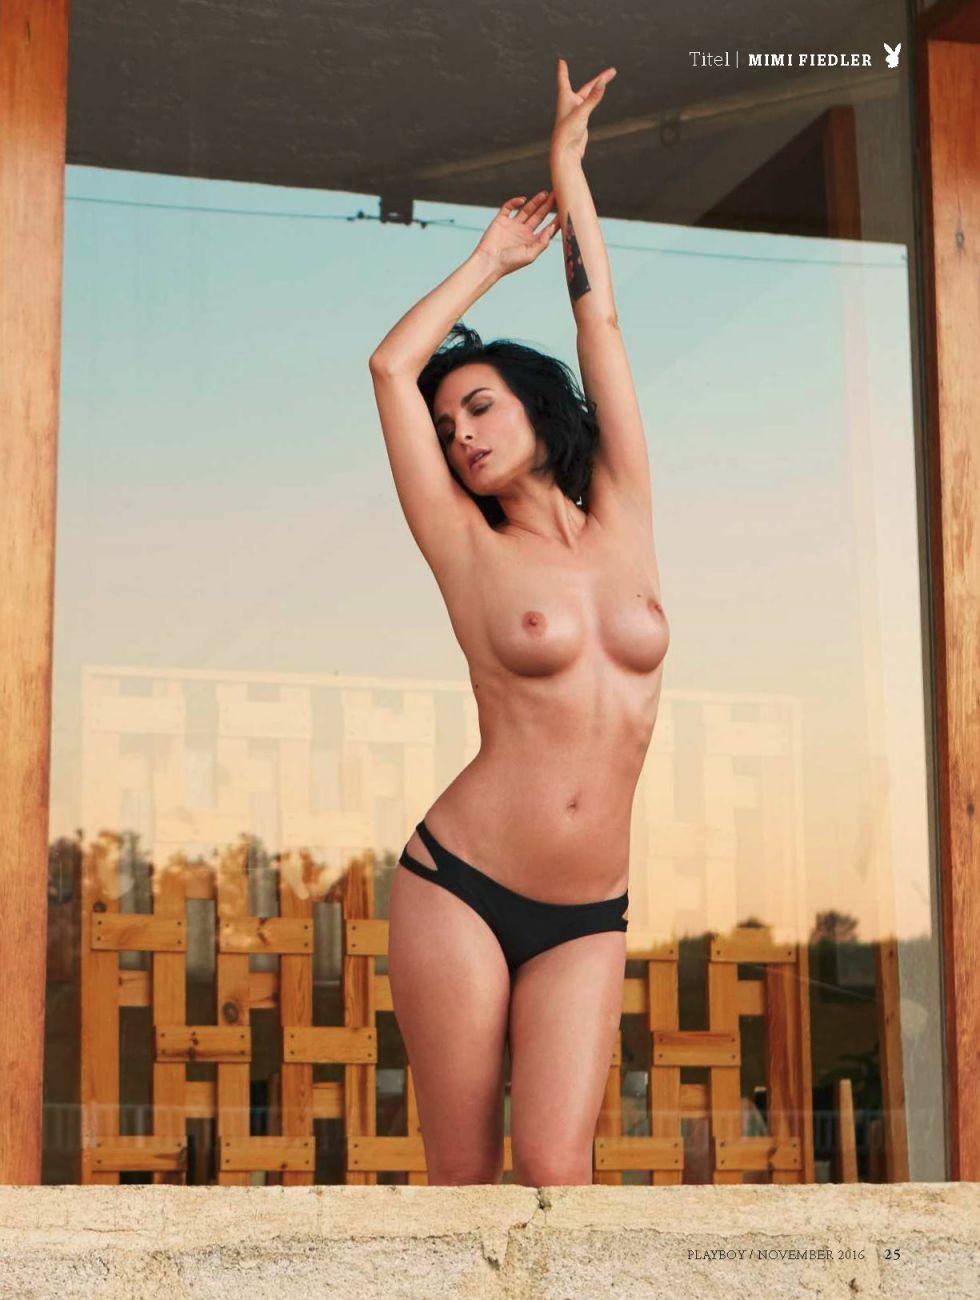 Fiedler Aka Miranda Leonhardt Actress Naked For Playboy-pic5819